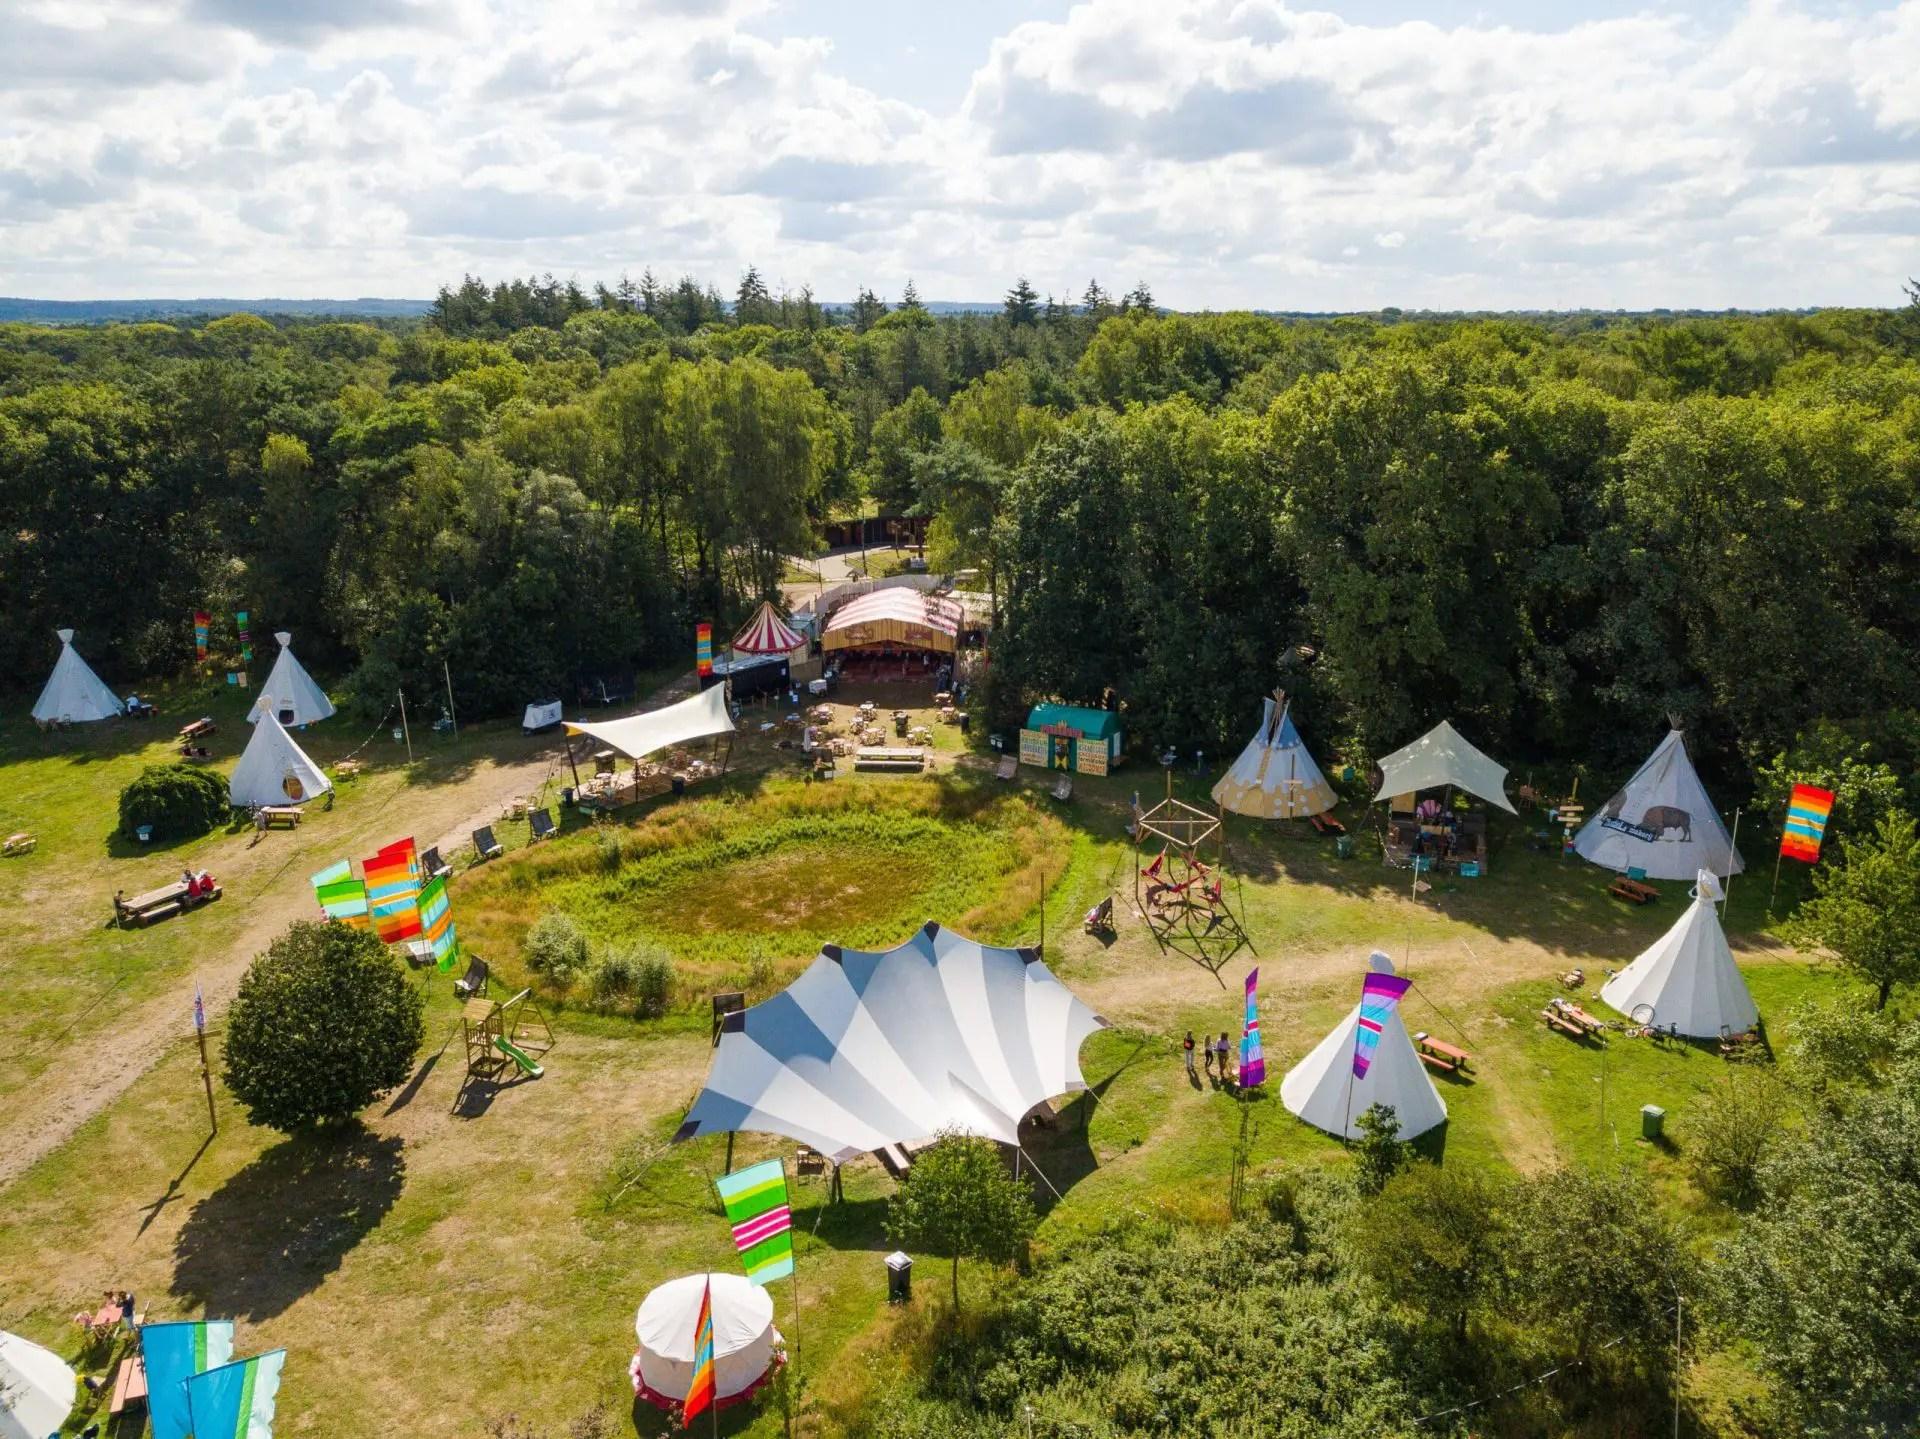 Overzicht - Camping de Wereld